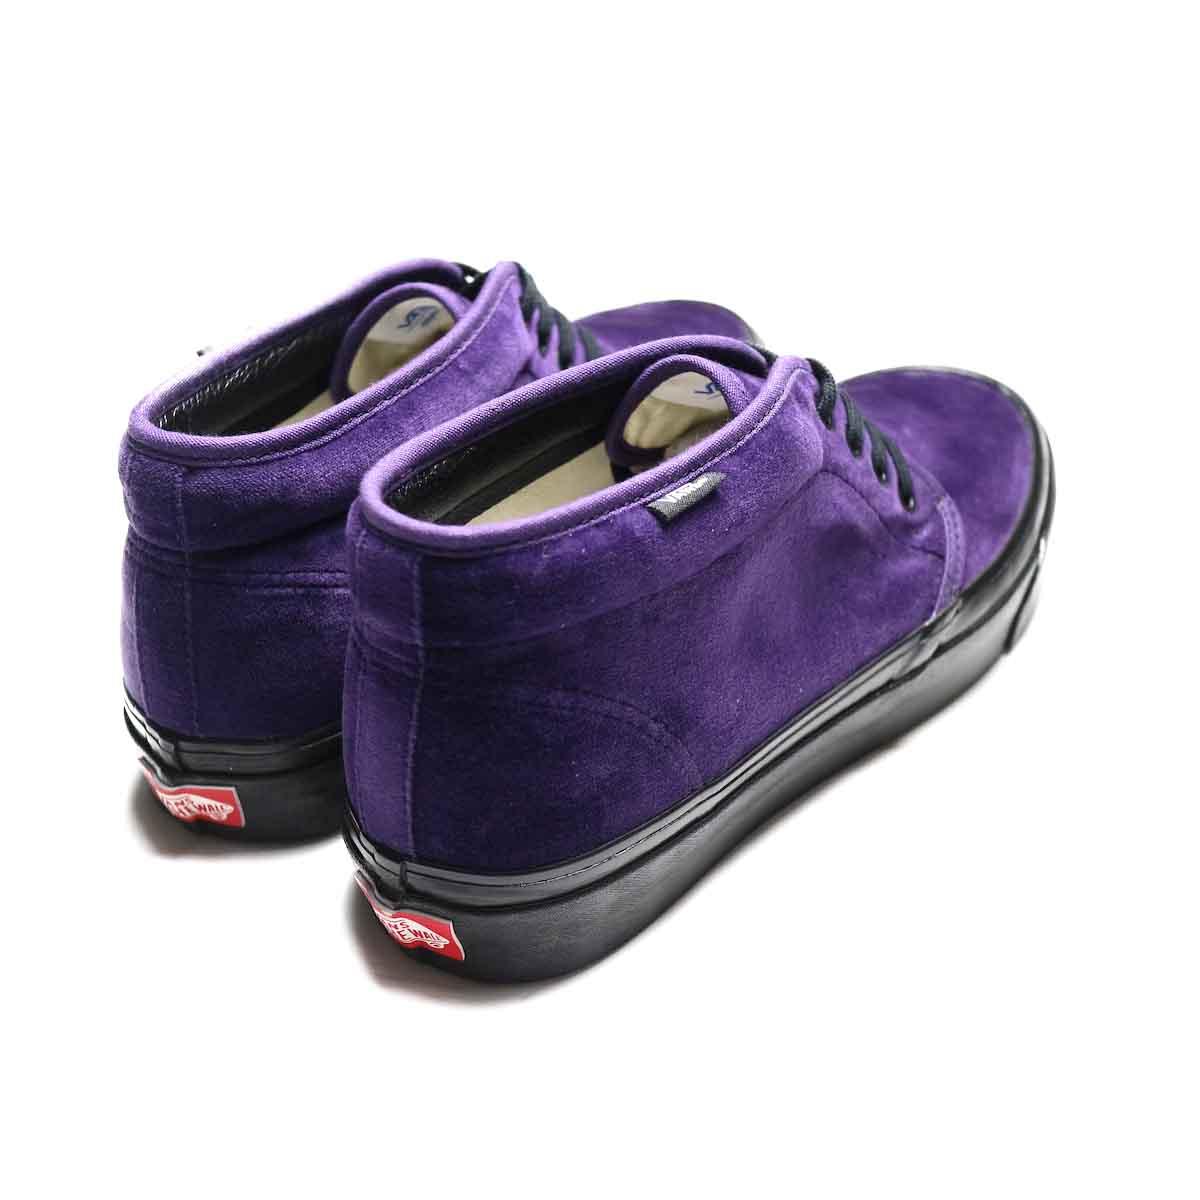 VANS / CHUKKA 49 DX (ANAHEIM FACTORY) (Purple VELVET)背面